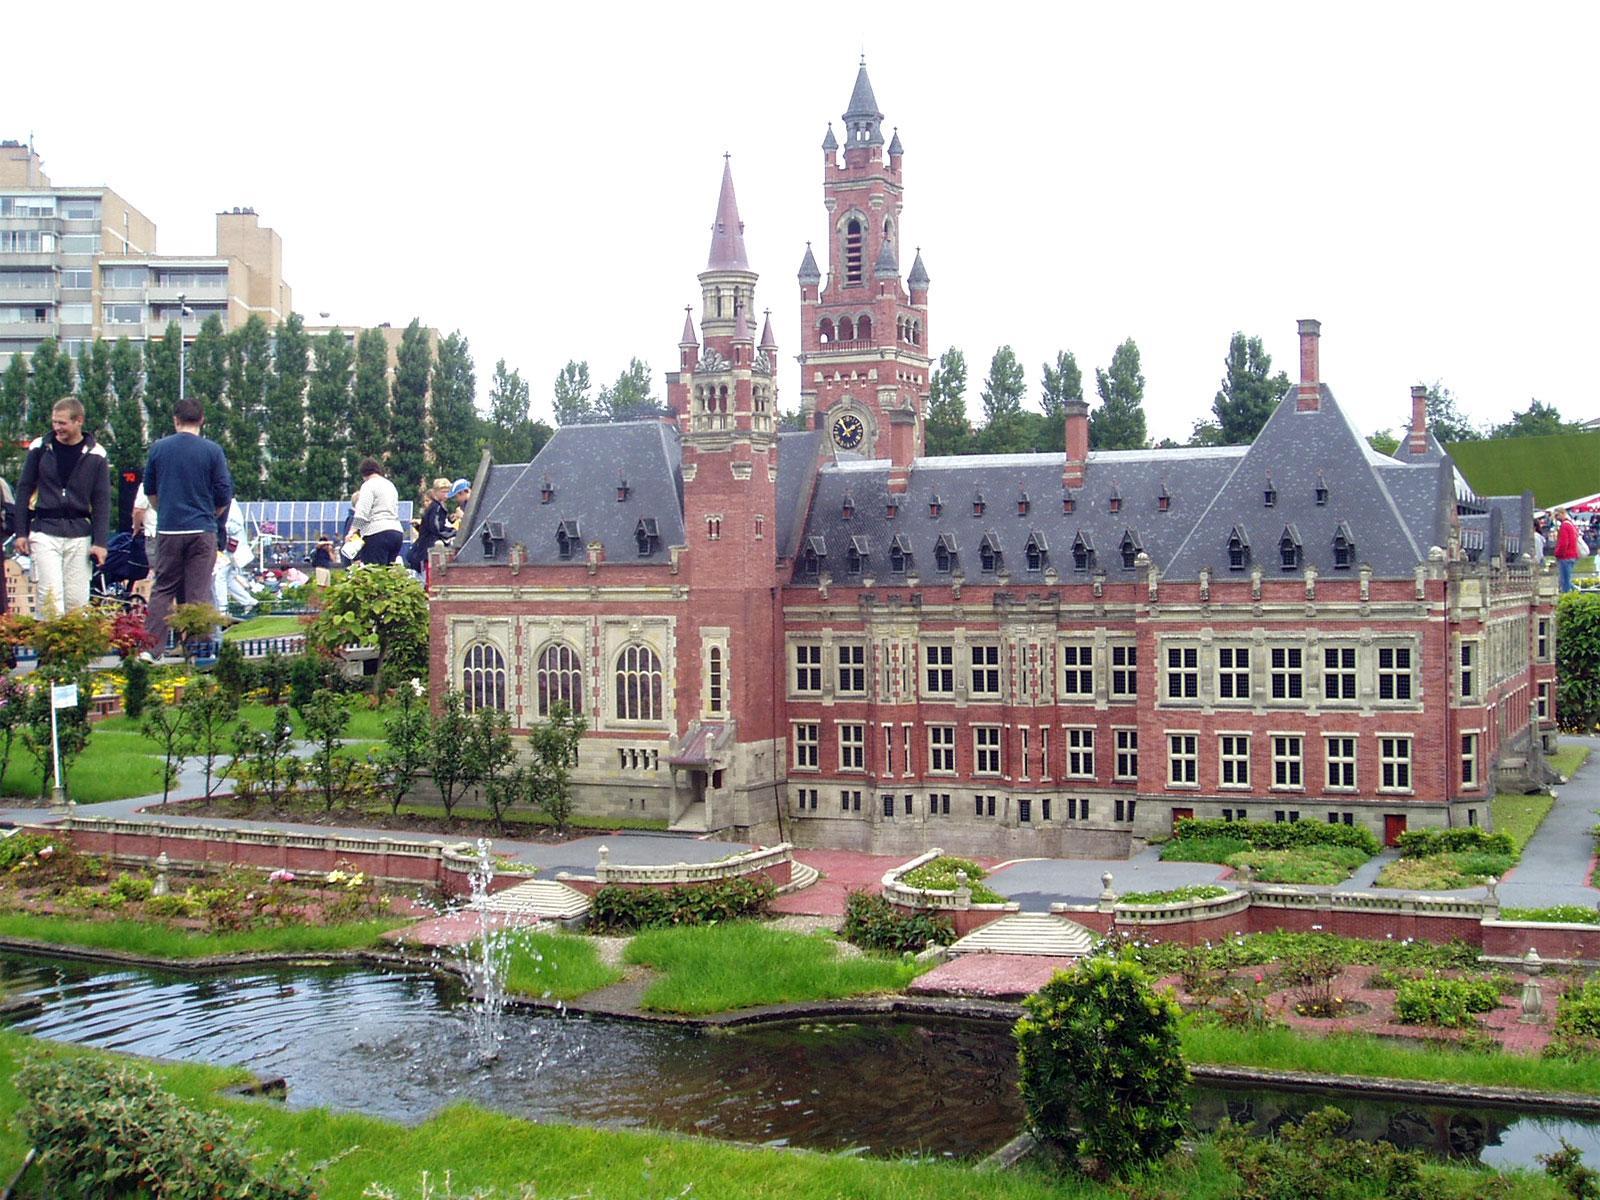 Top World Travel Destinations The Hague Netherlands